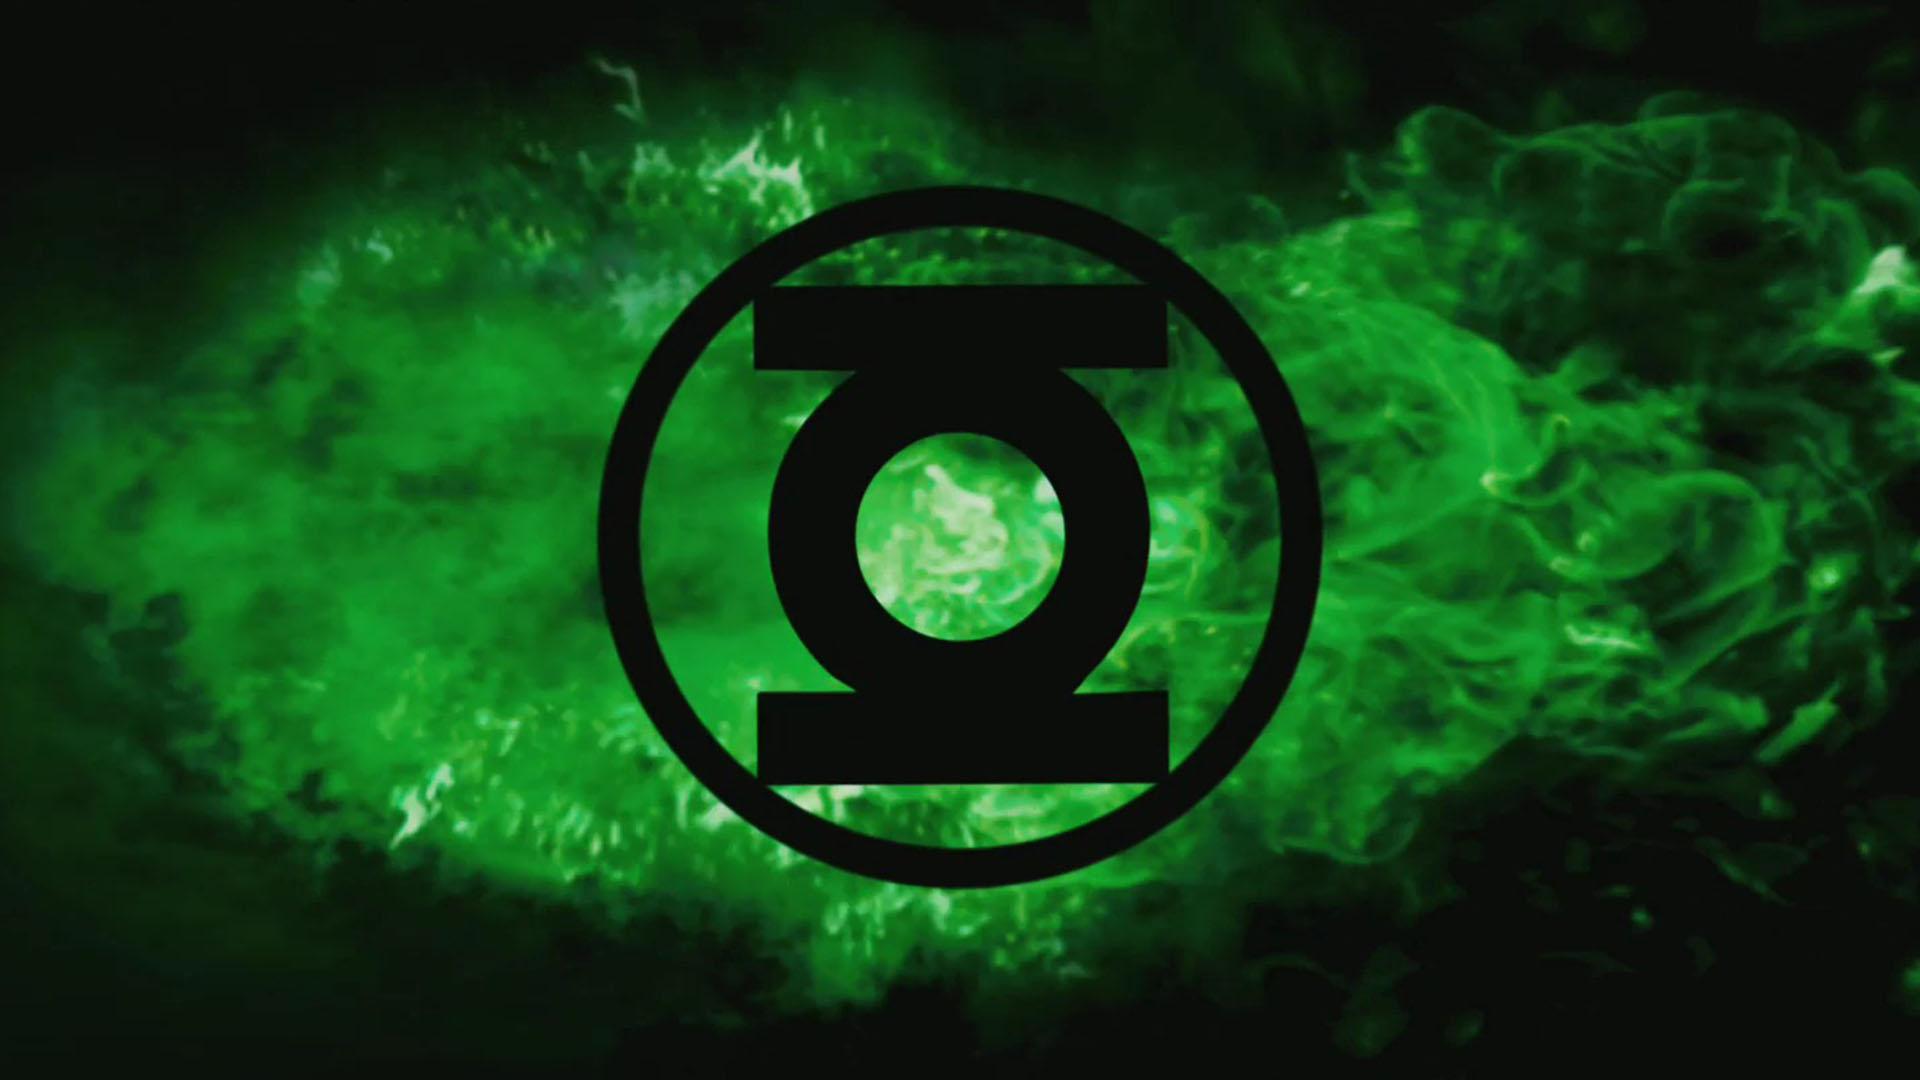 Green Lantern TheWallpapers Desktop Wallpapers for HD 1920x1080